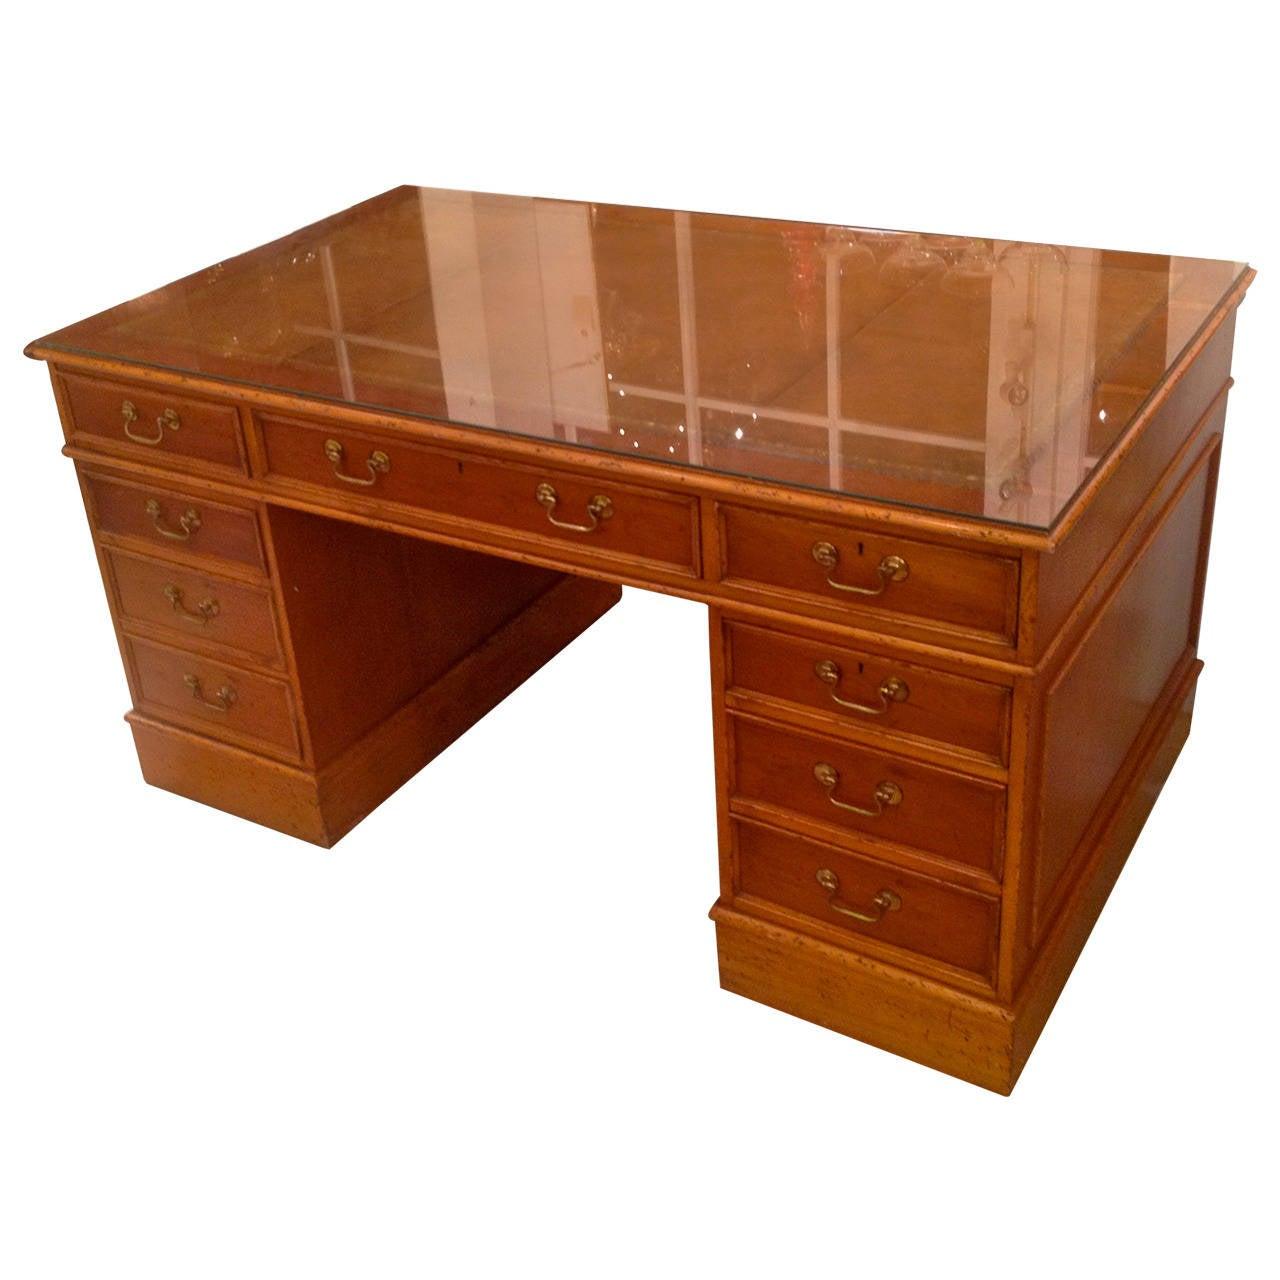 19th Century English Mahogany Pedestal Desk